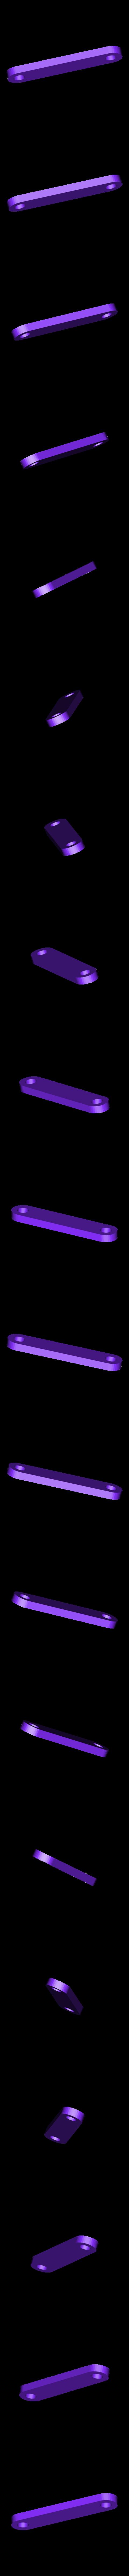 Part6x2.STL Download free STL file Recipe book / iPad / tablet holder • Design to 3D print, poorveshmistry